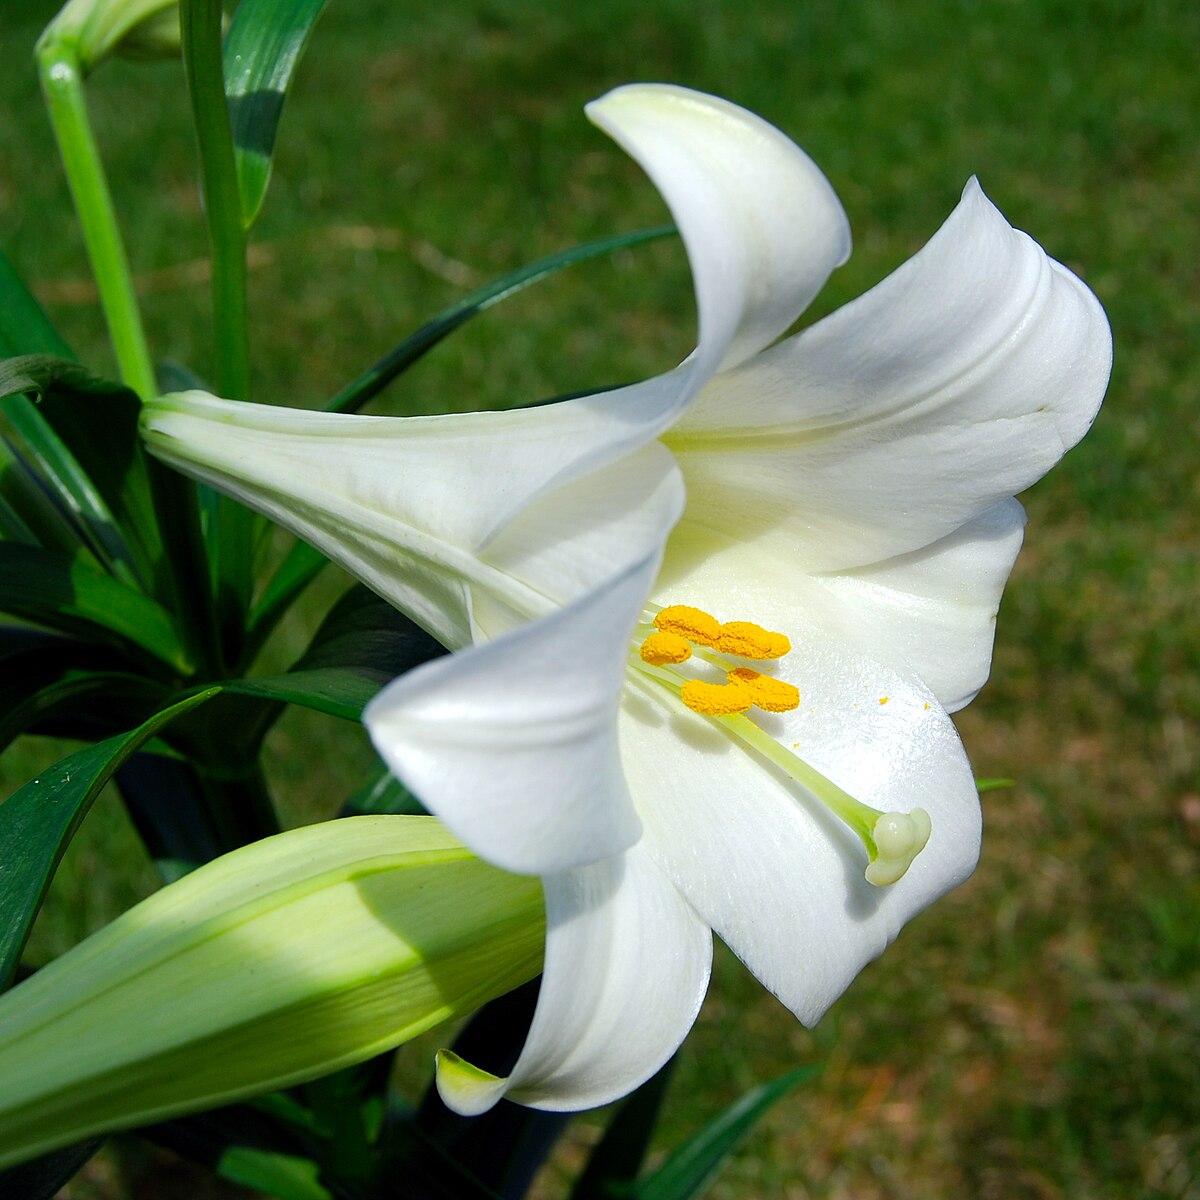 Lilium longiflorum - Wikipedia: https://en.wikipedia.org/wiki/Lilium_longiflorum